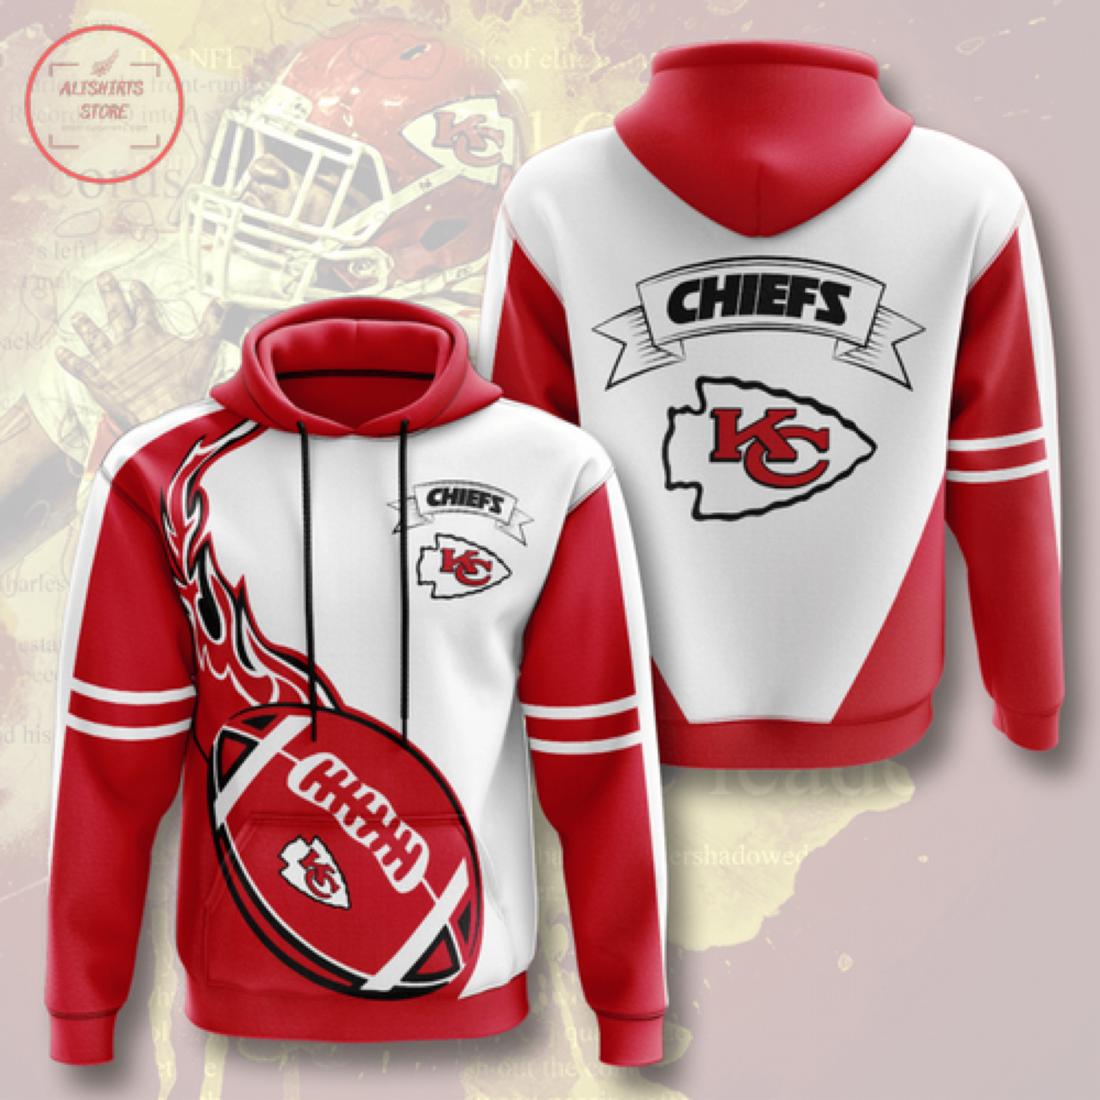 Personalized NFL Kansas City Chiefs Hoodie 3D